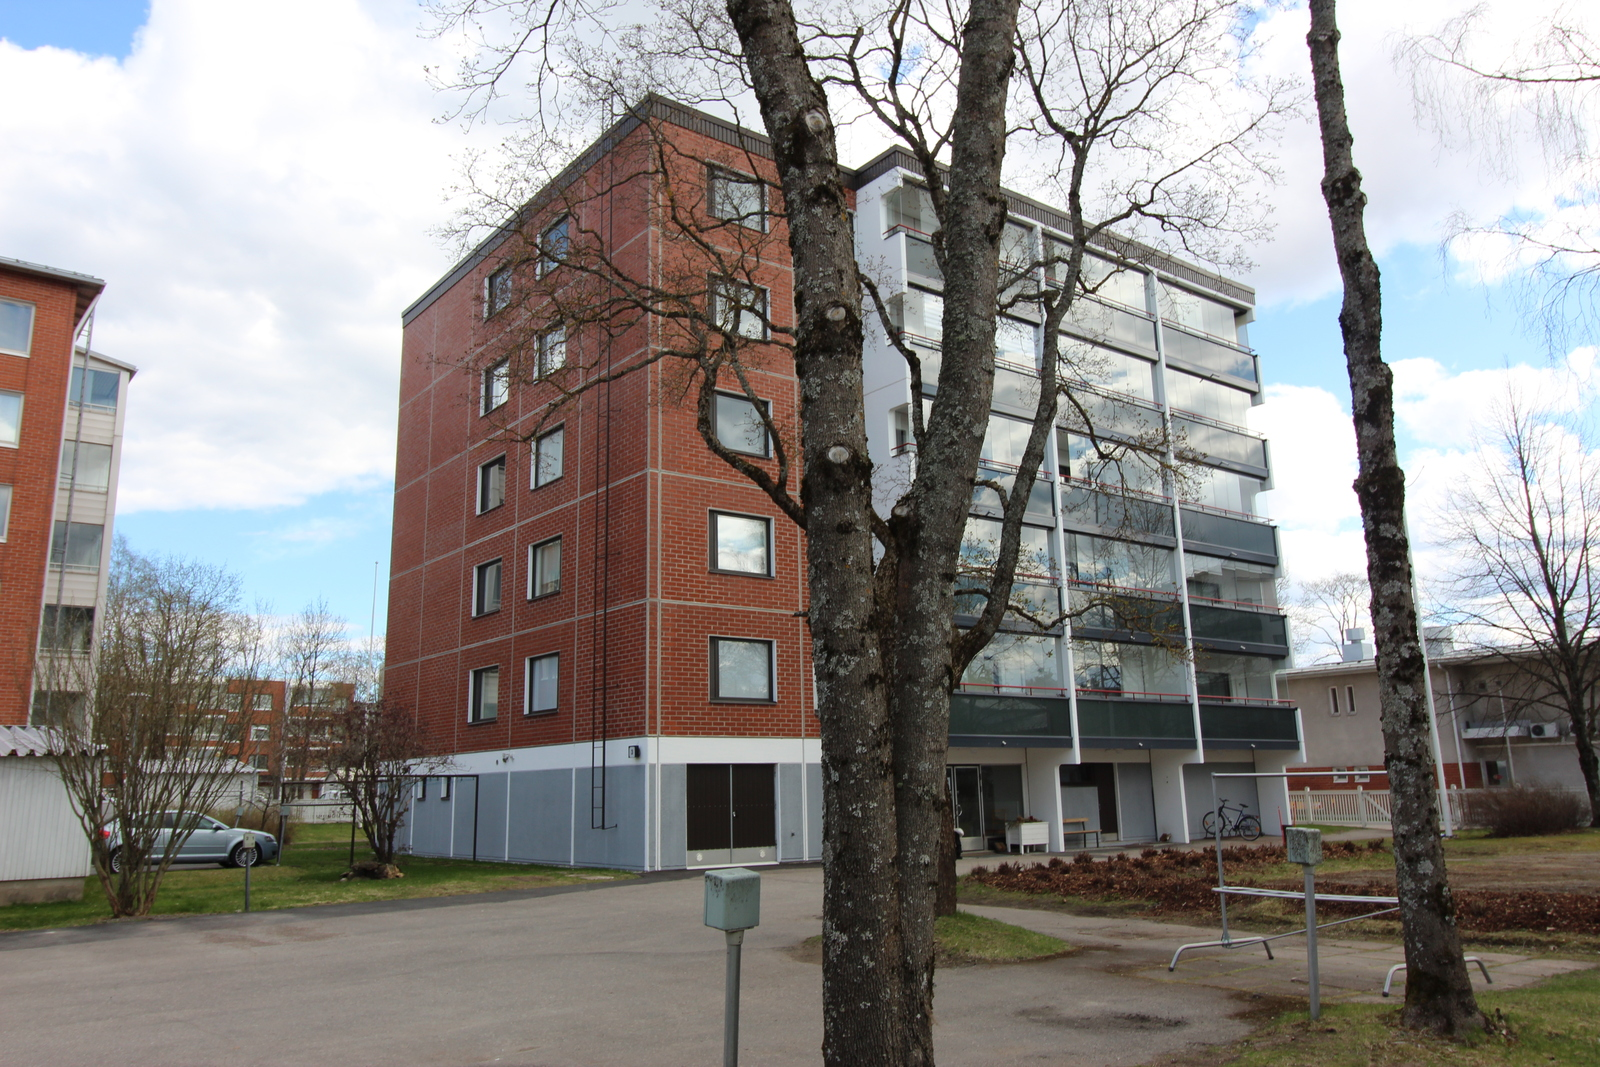 Peltola, Lappeenranta